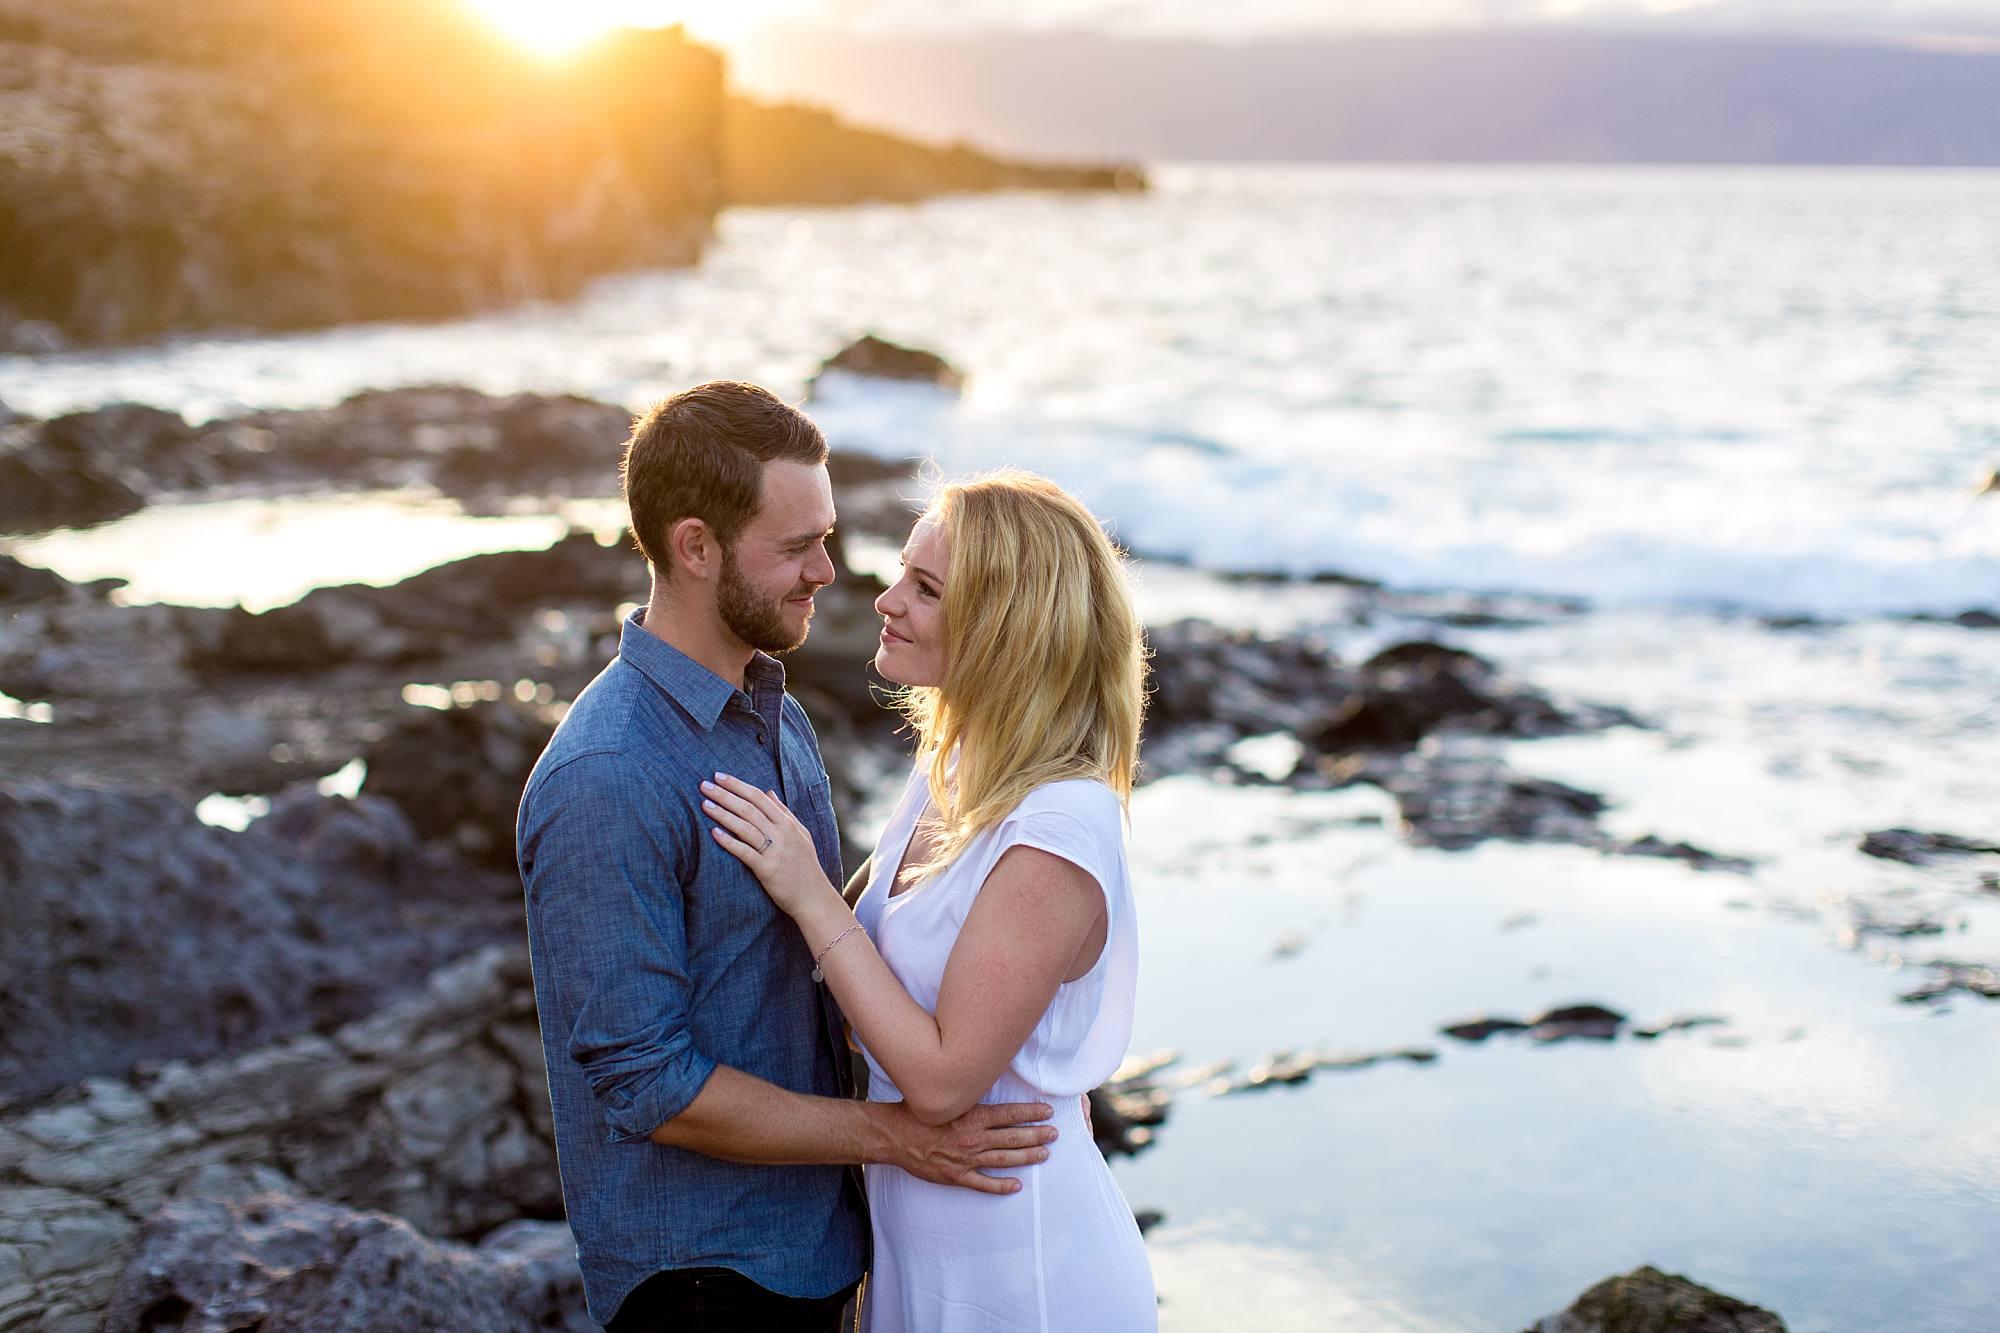 beautiful Maui sunset peeking over the rocks over newly engaged couple